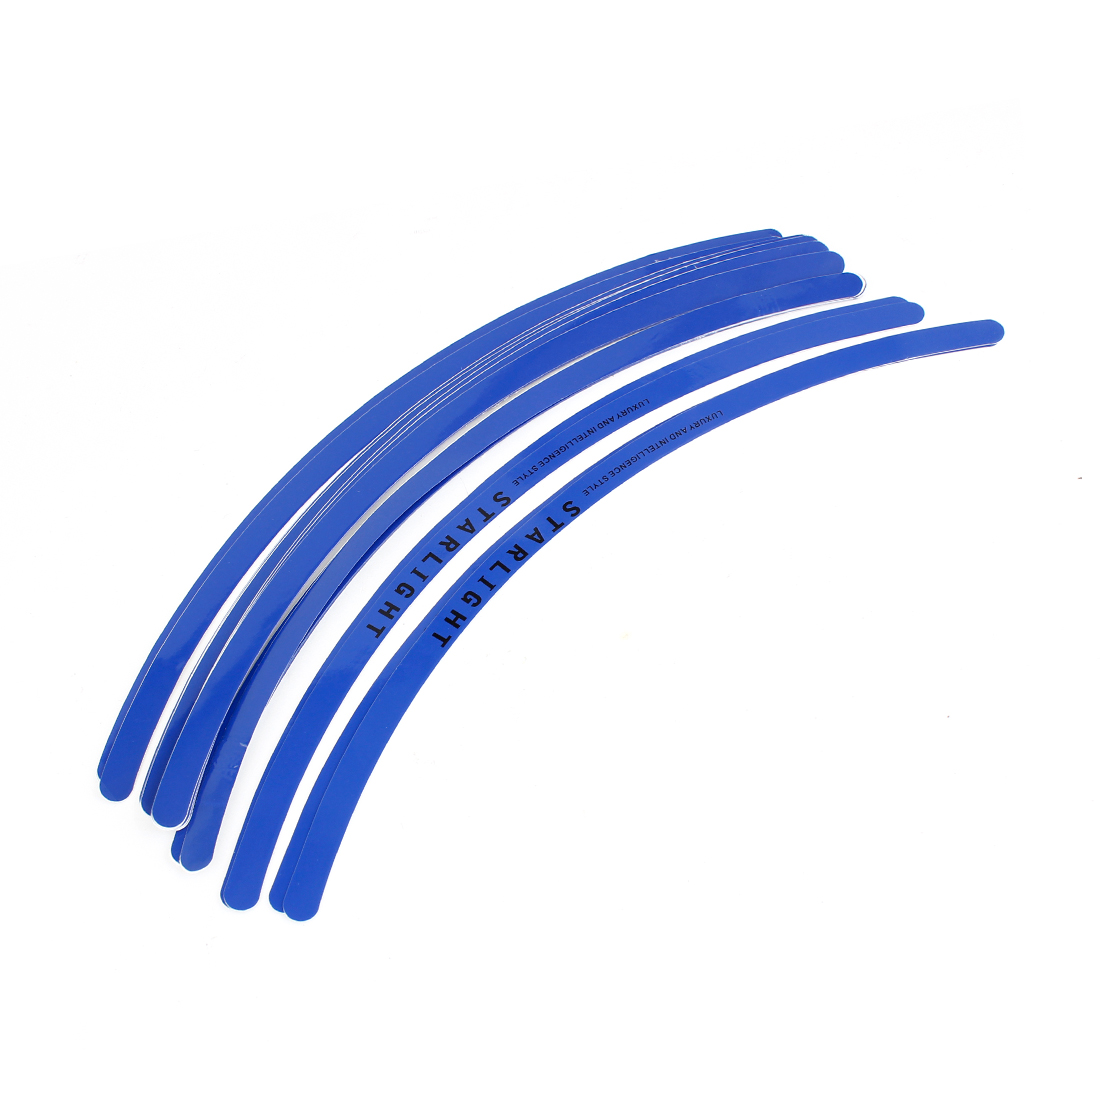 28pcs Rim Stripe Wheel Vinyl Decal Tape Sticker Blue for Car Truck Motorcycle